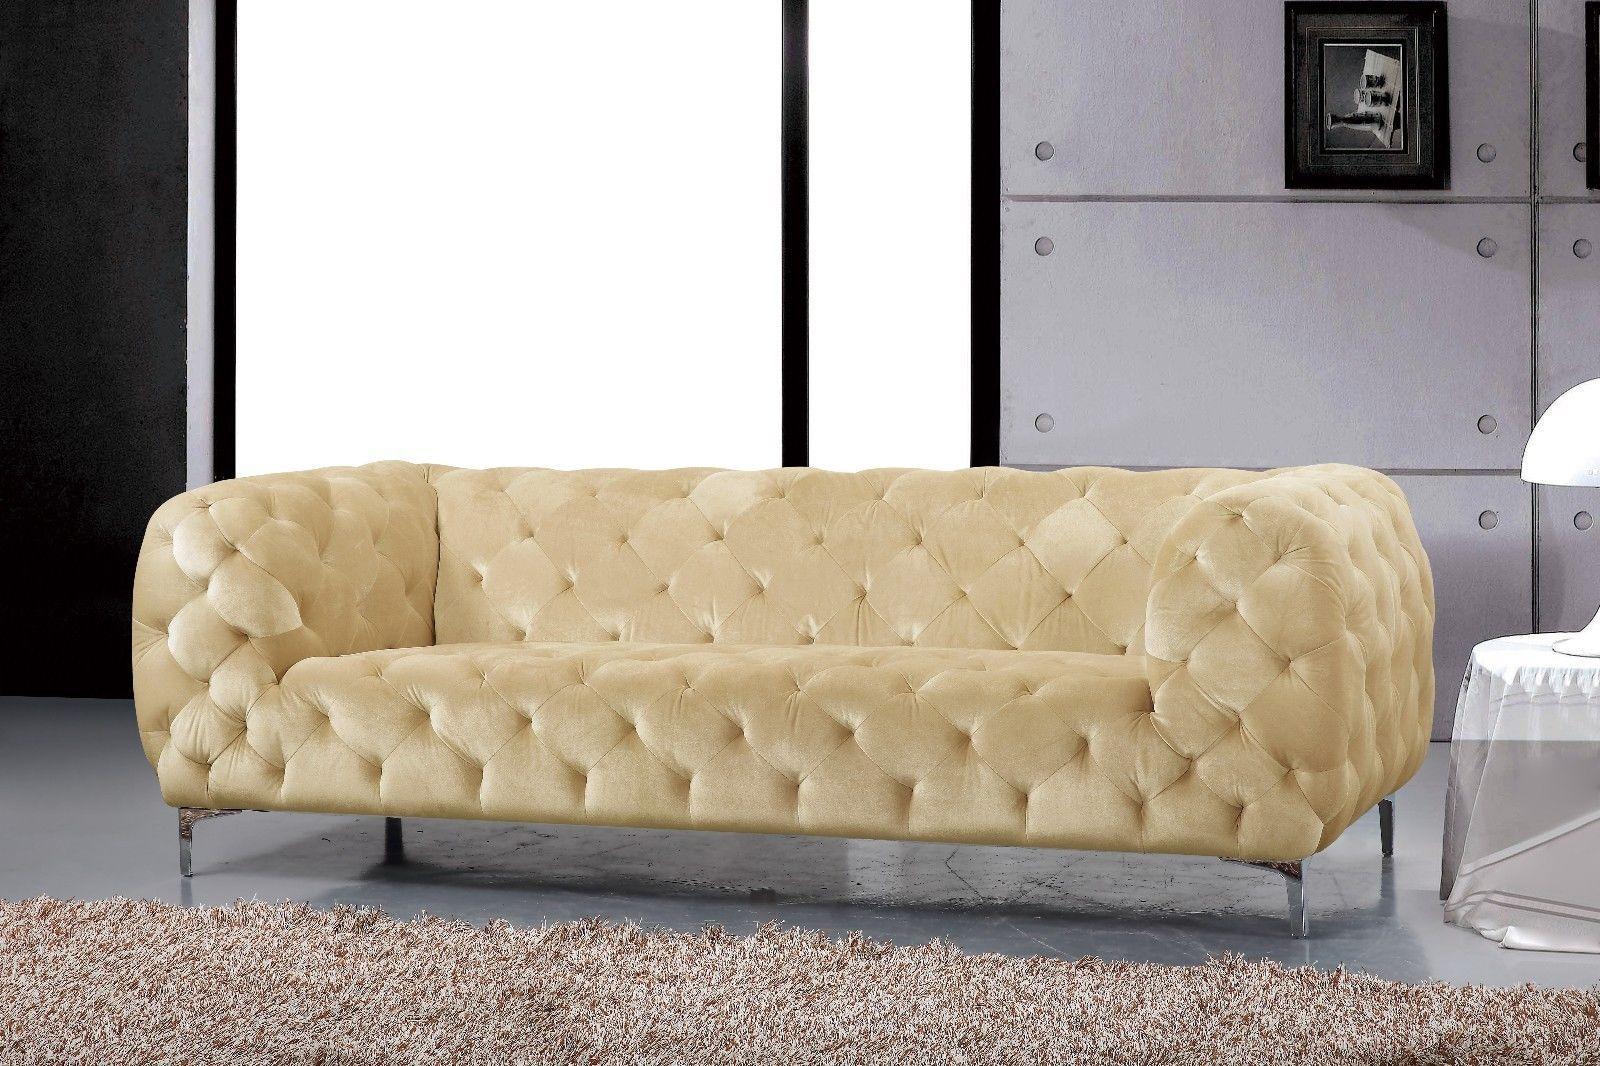 Meridian 646 Mercer Living Room Set 2pcs in Beige Chrome Legs Contemporary Style